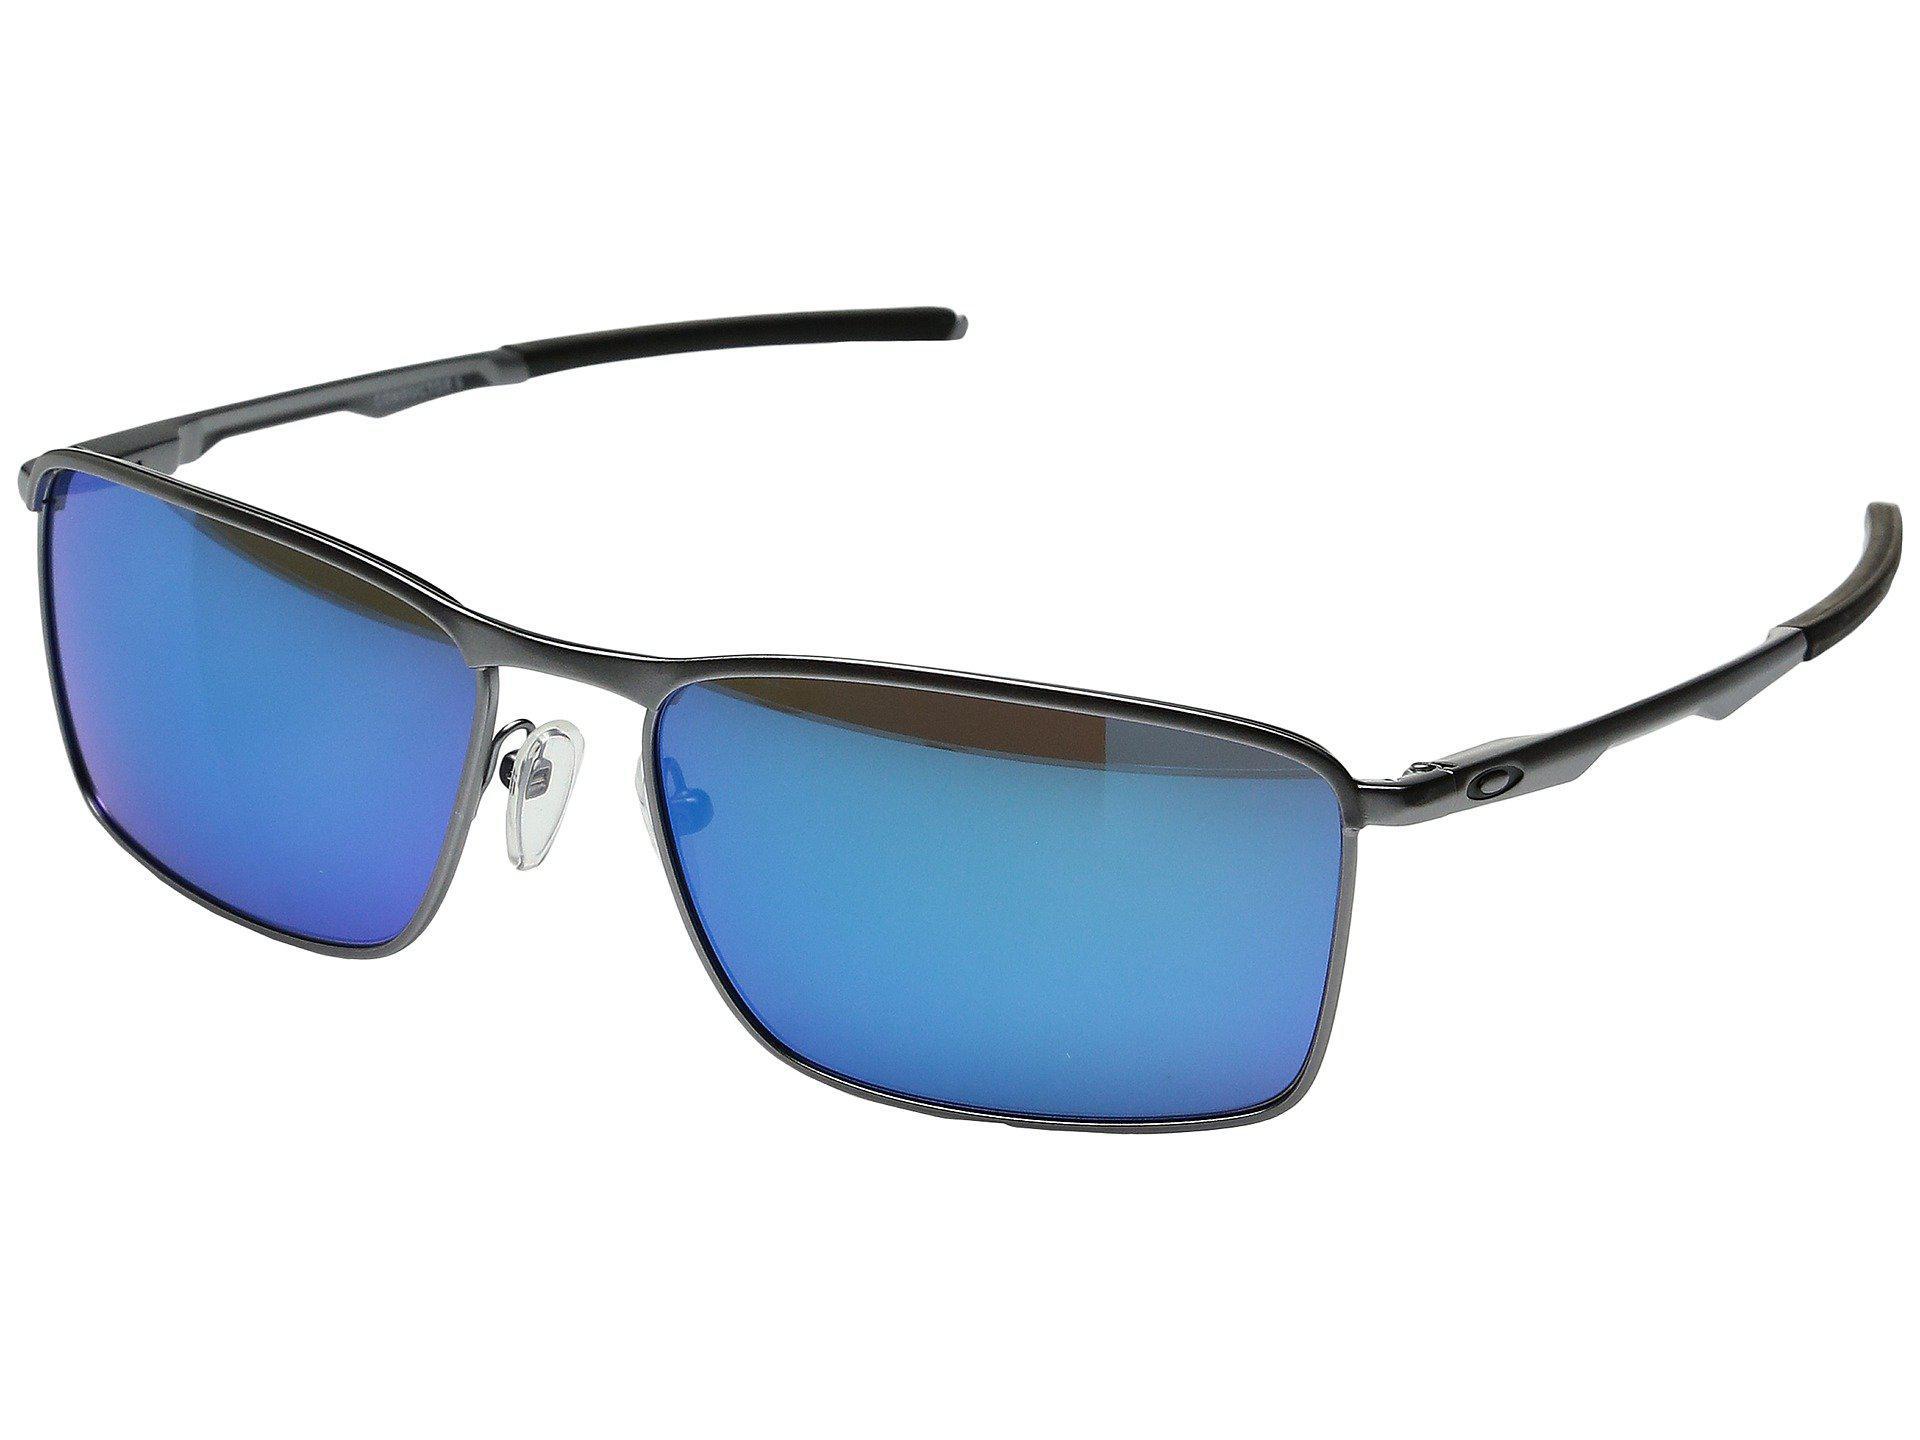 0eaa4206c6 Lyst - Oakley Conductor 6 (lead sapphire Iridium) Sport Sunglasses ...